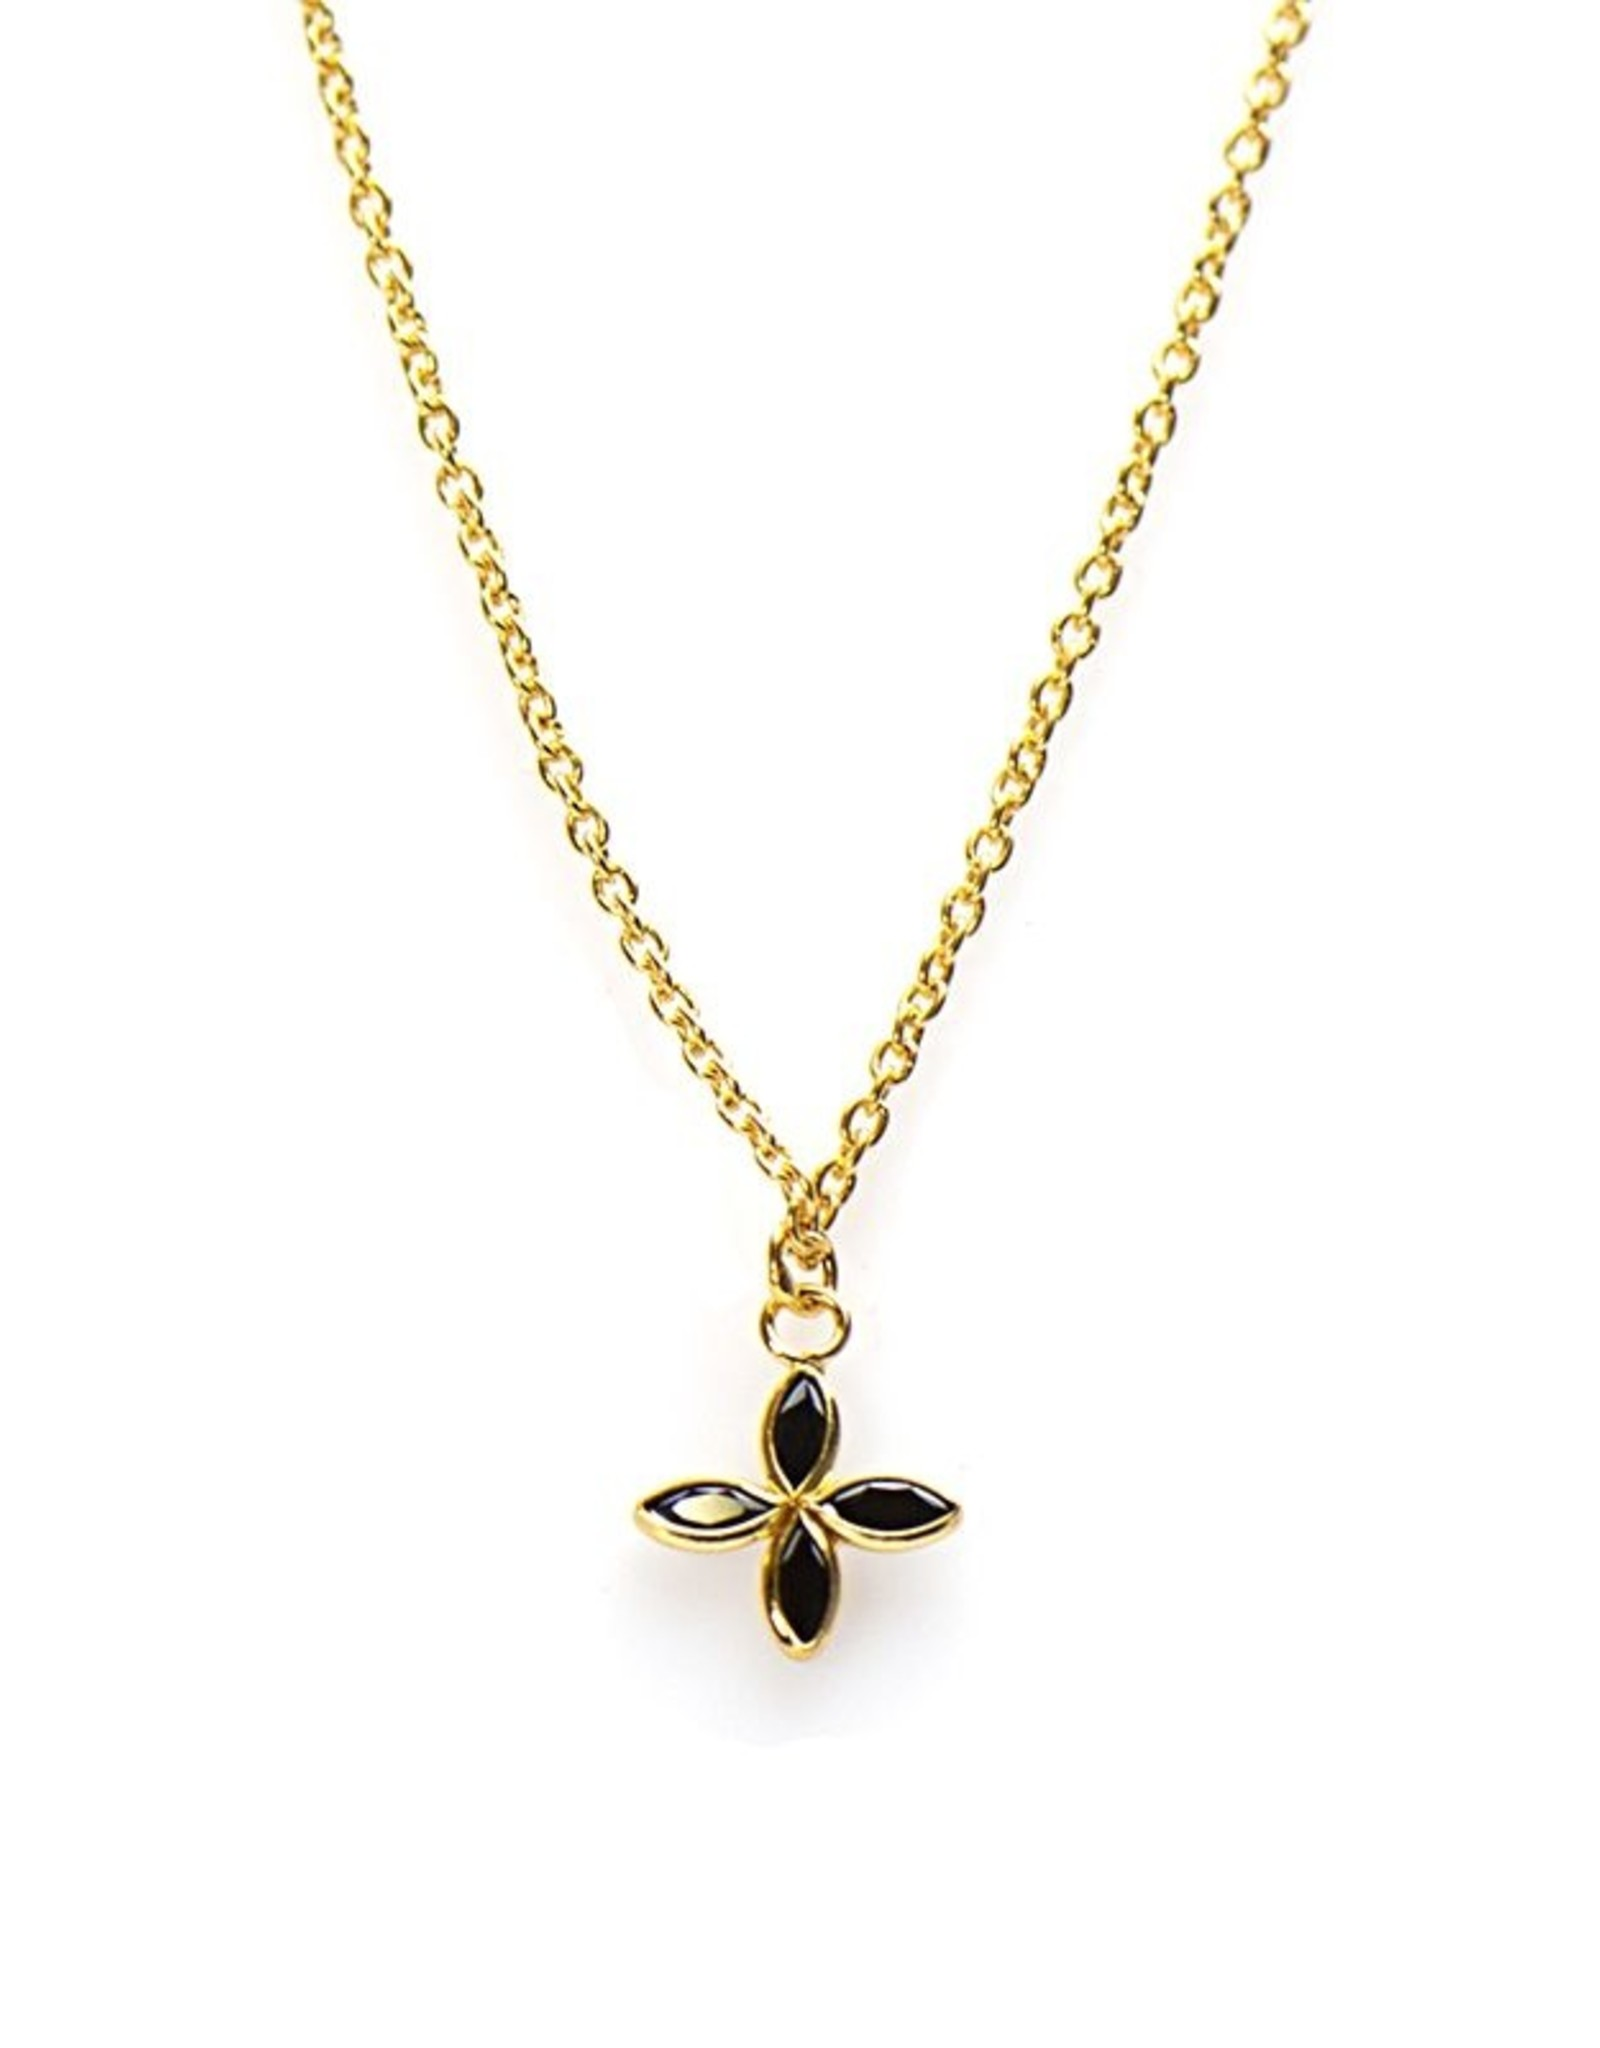 Karma Necklace Black Zirconia Flower Goldplated